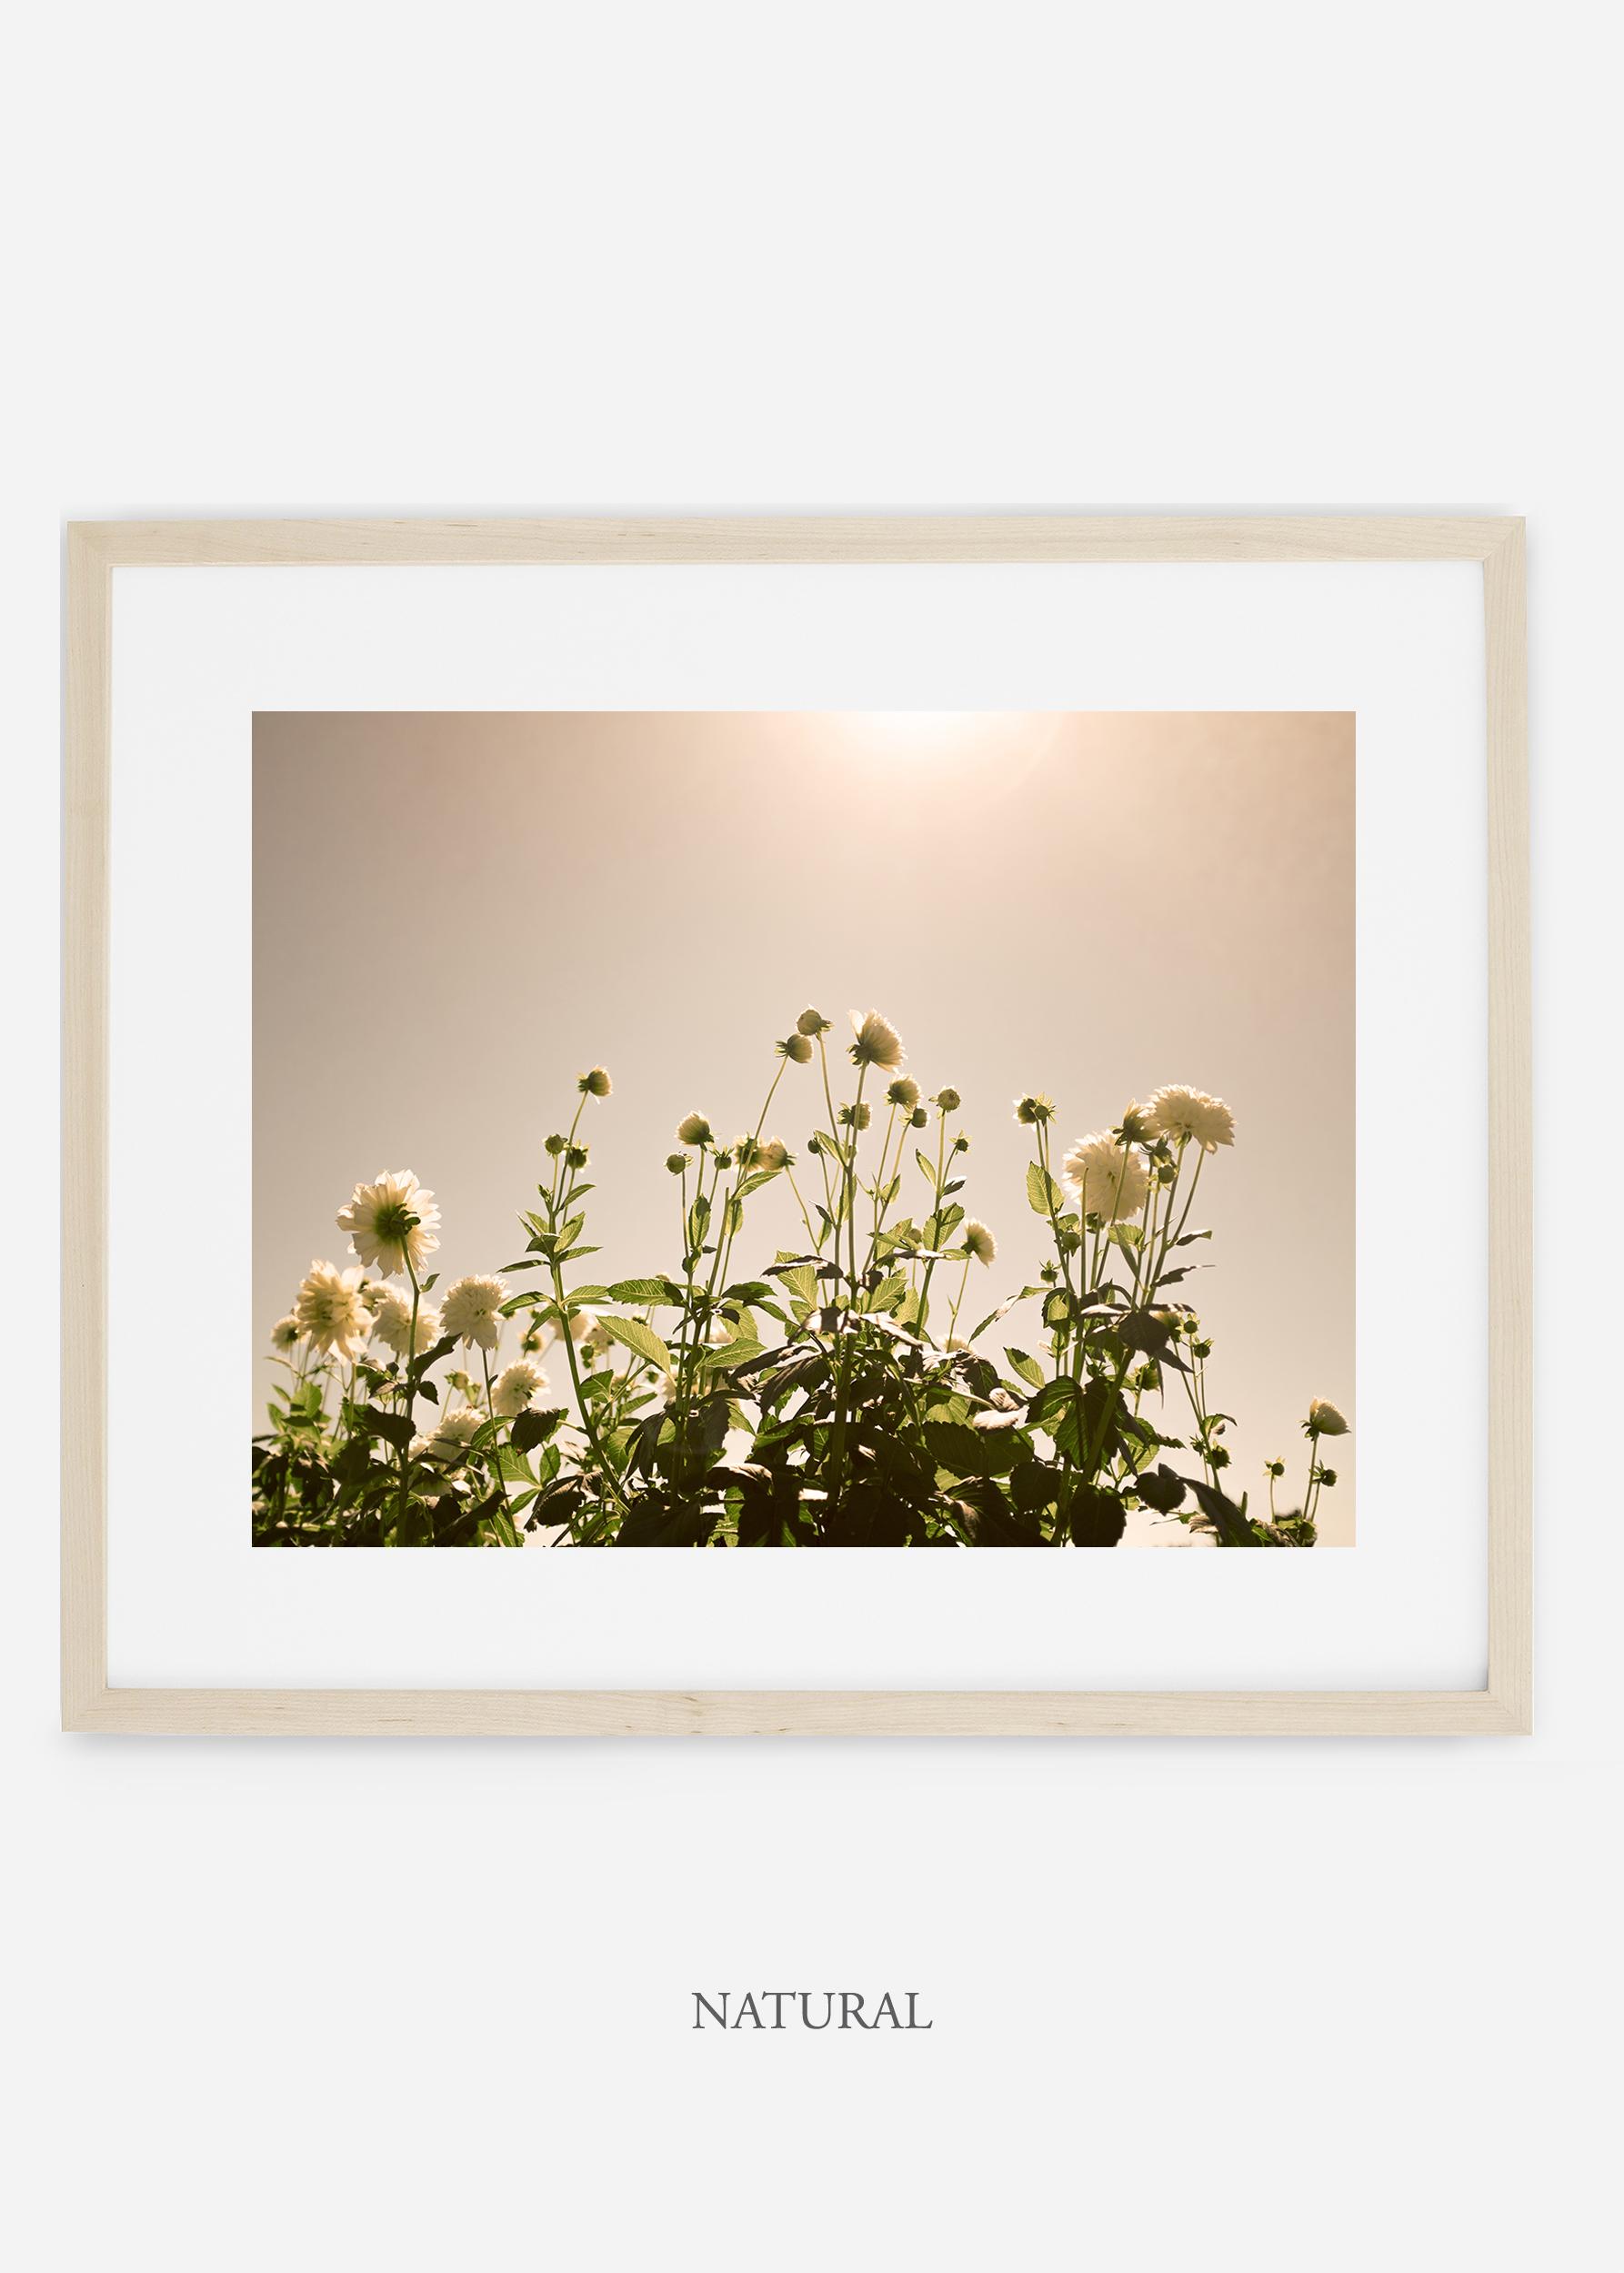 wilder-california-naturalframe-dahlia-7-minimal-botanical-print-art-interior-design.jpg